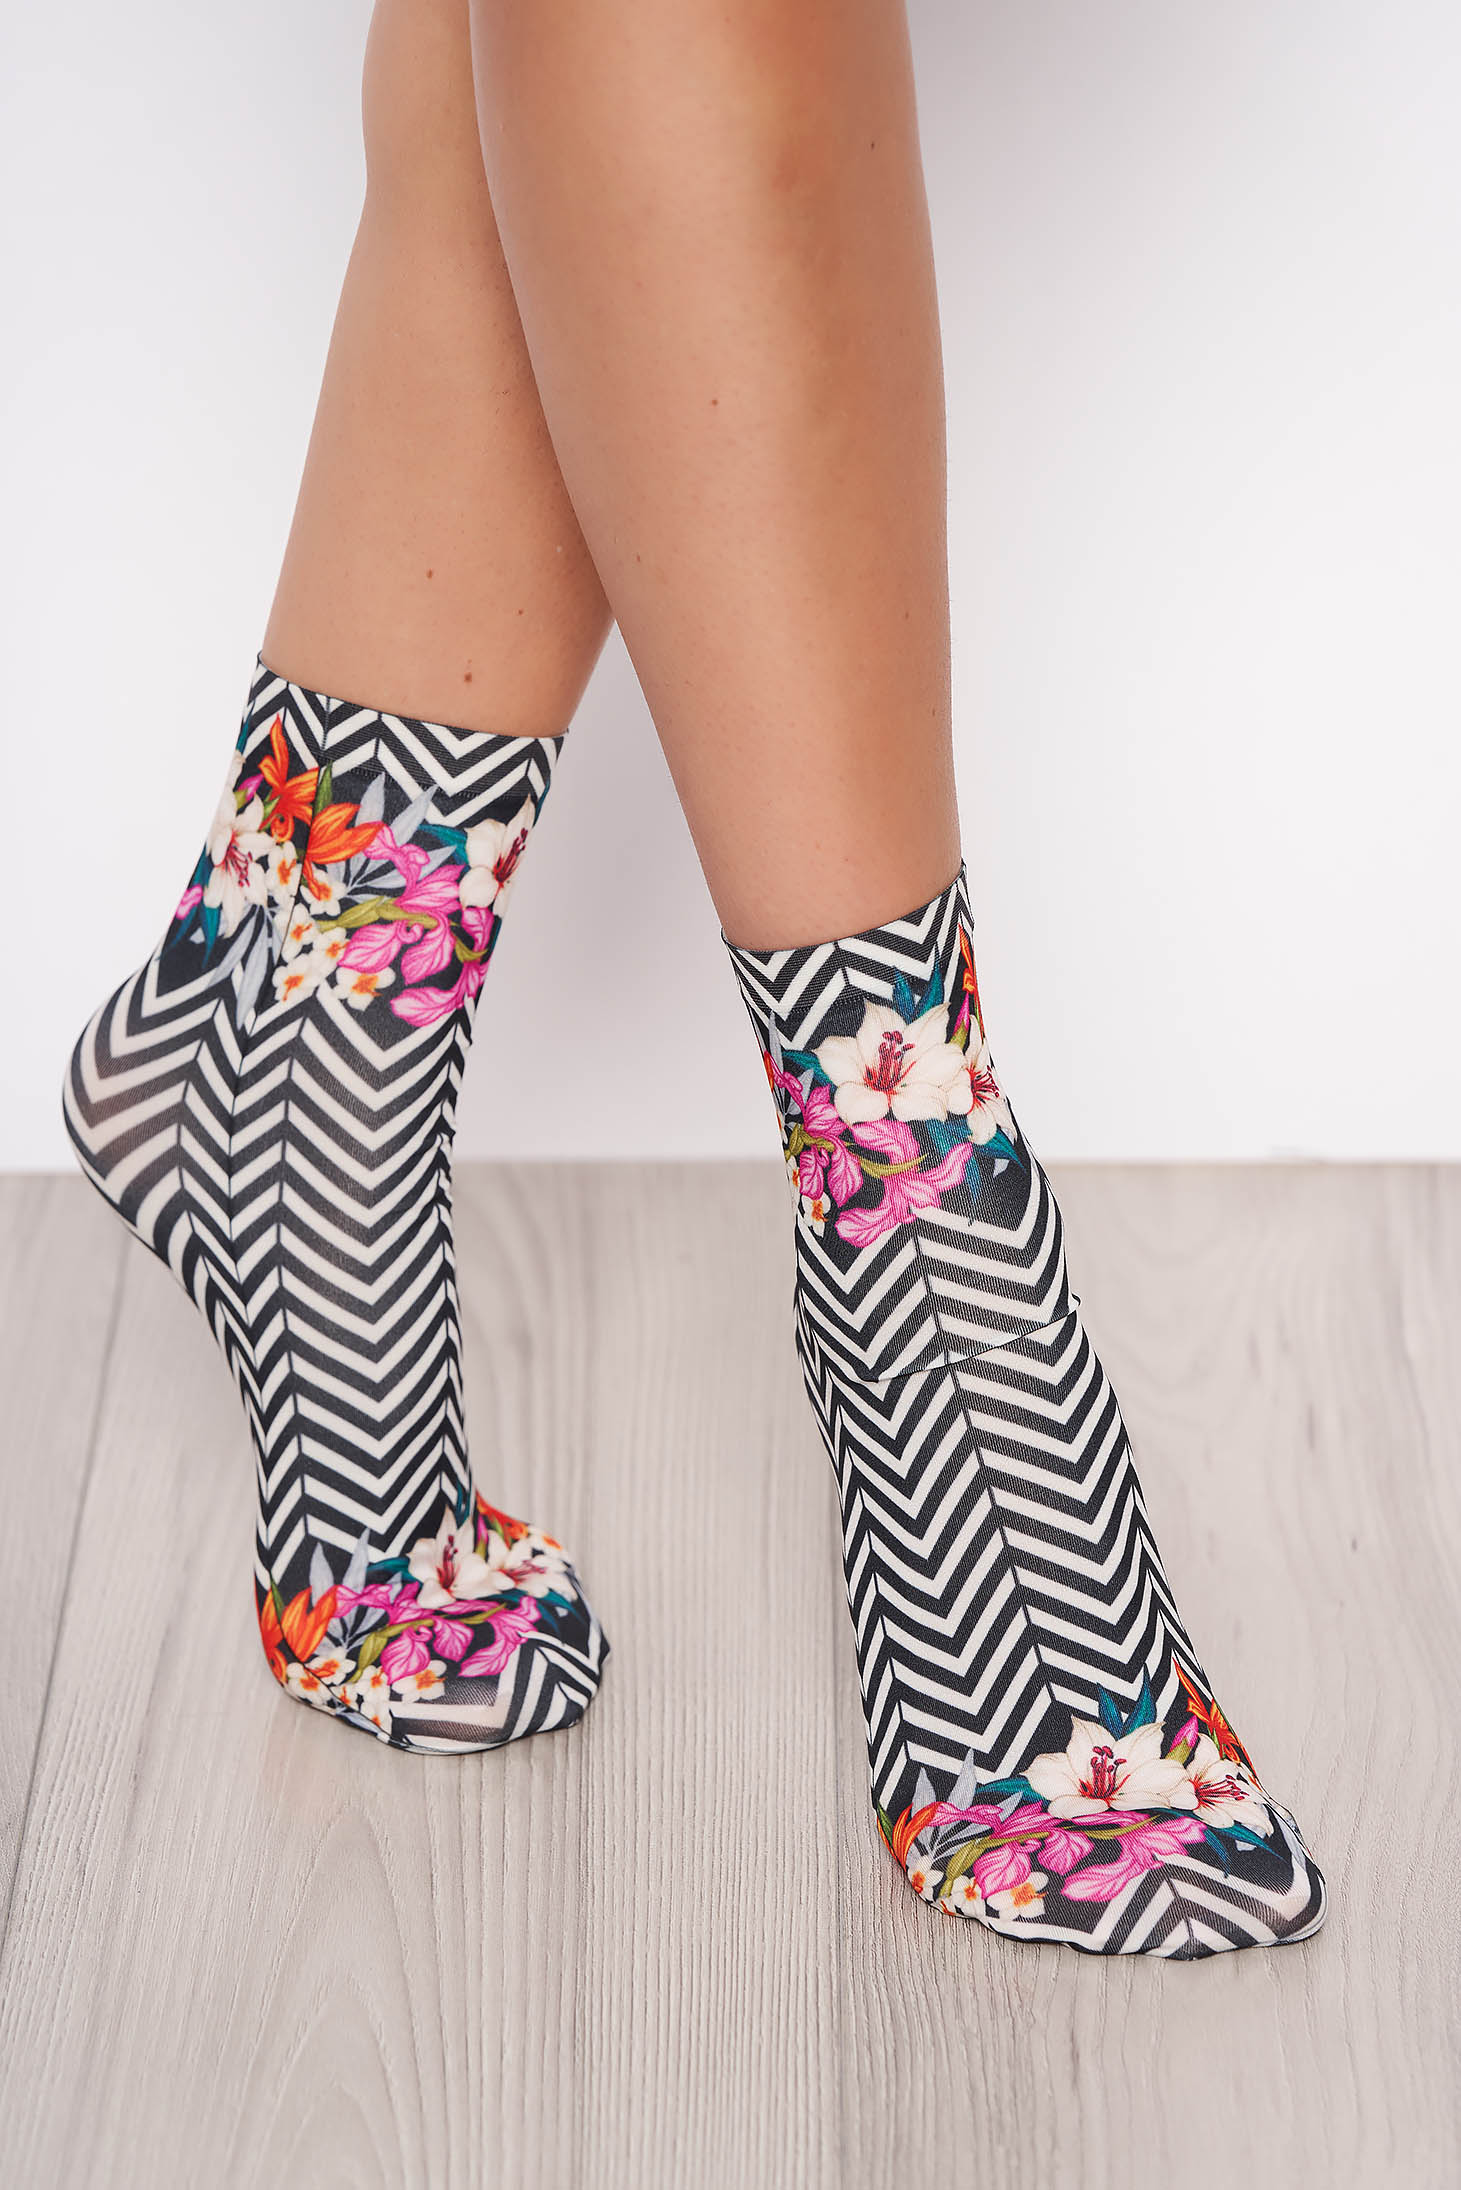 Black socks soft fabric with print details